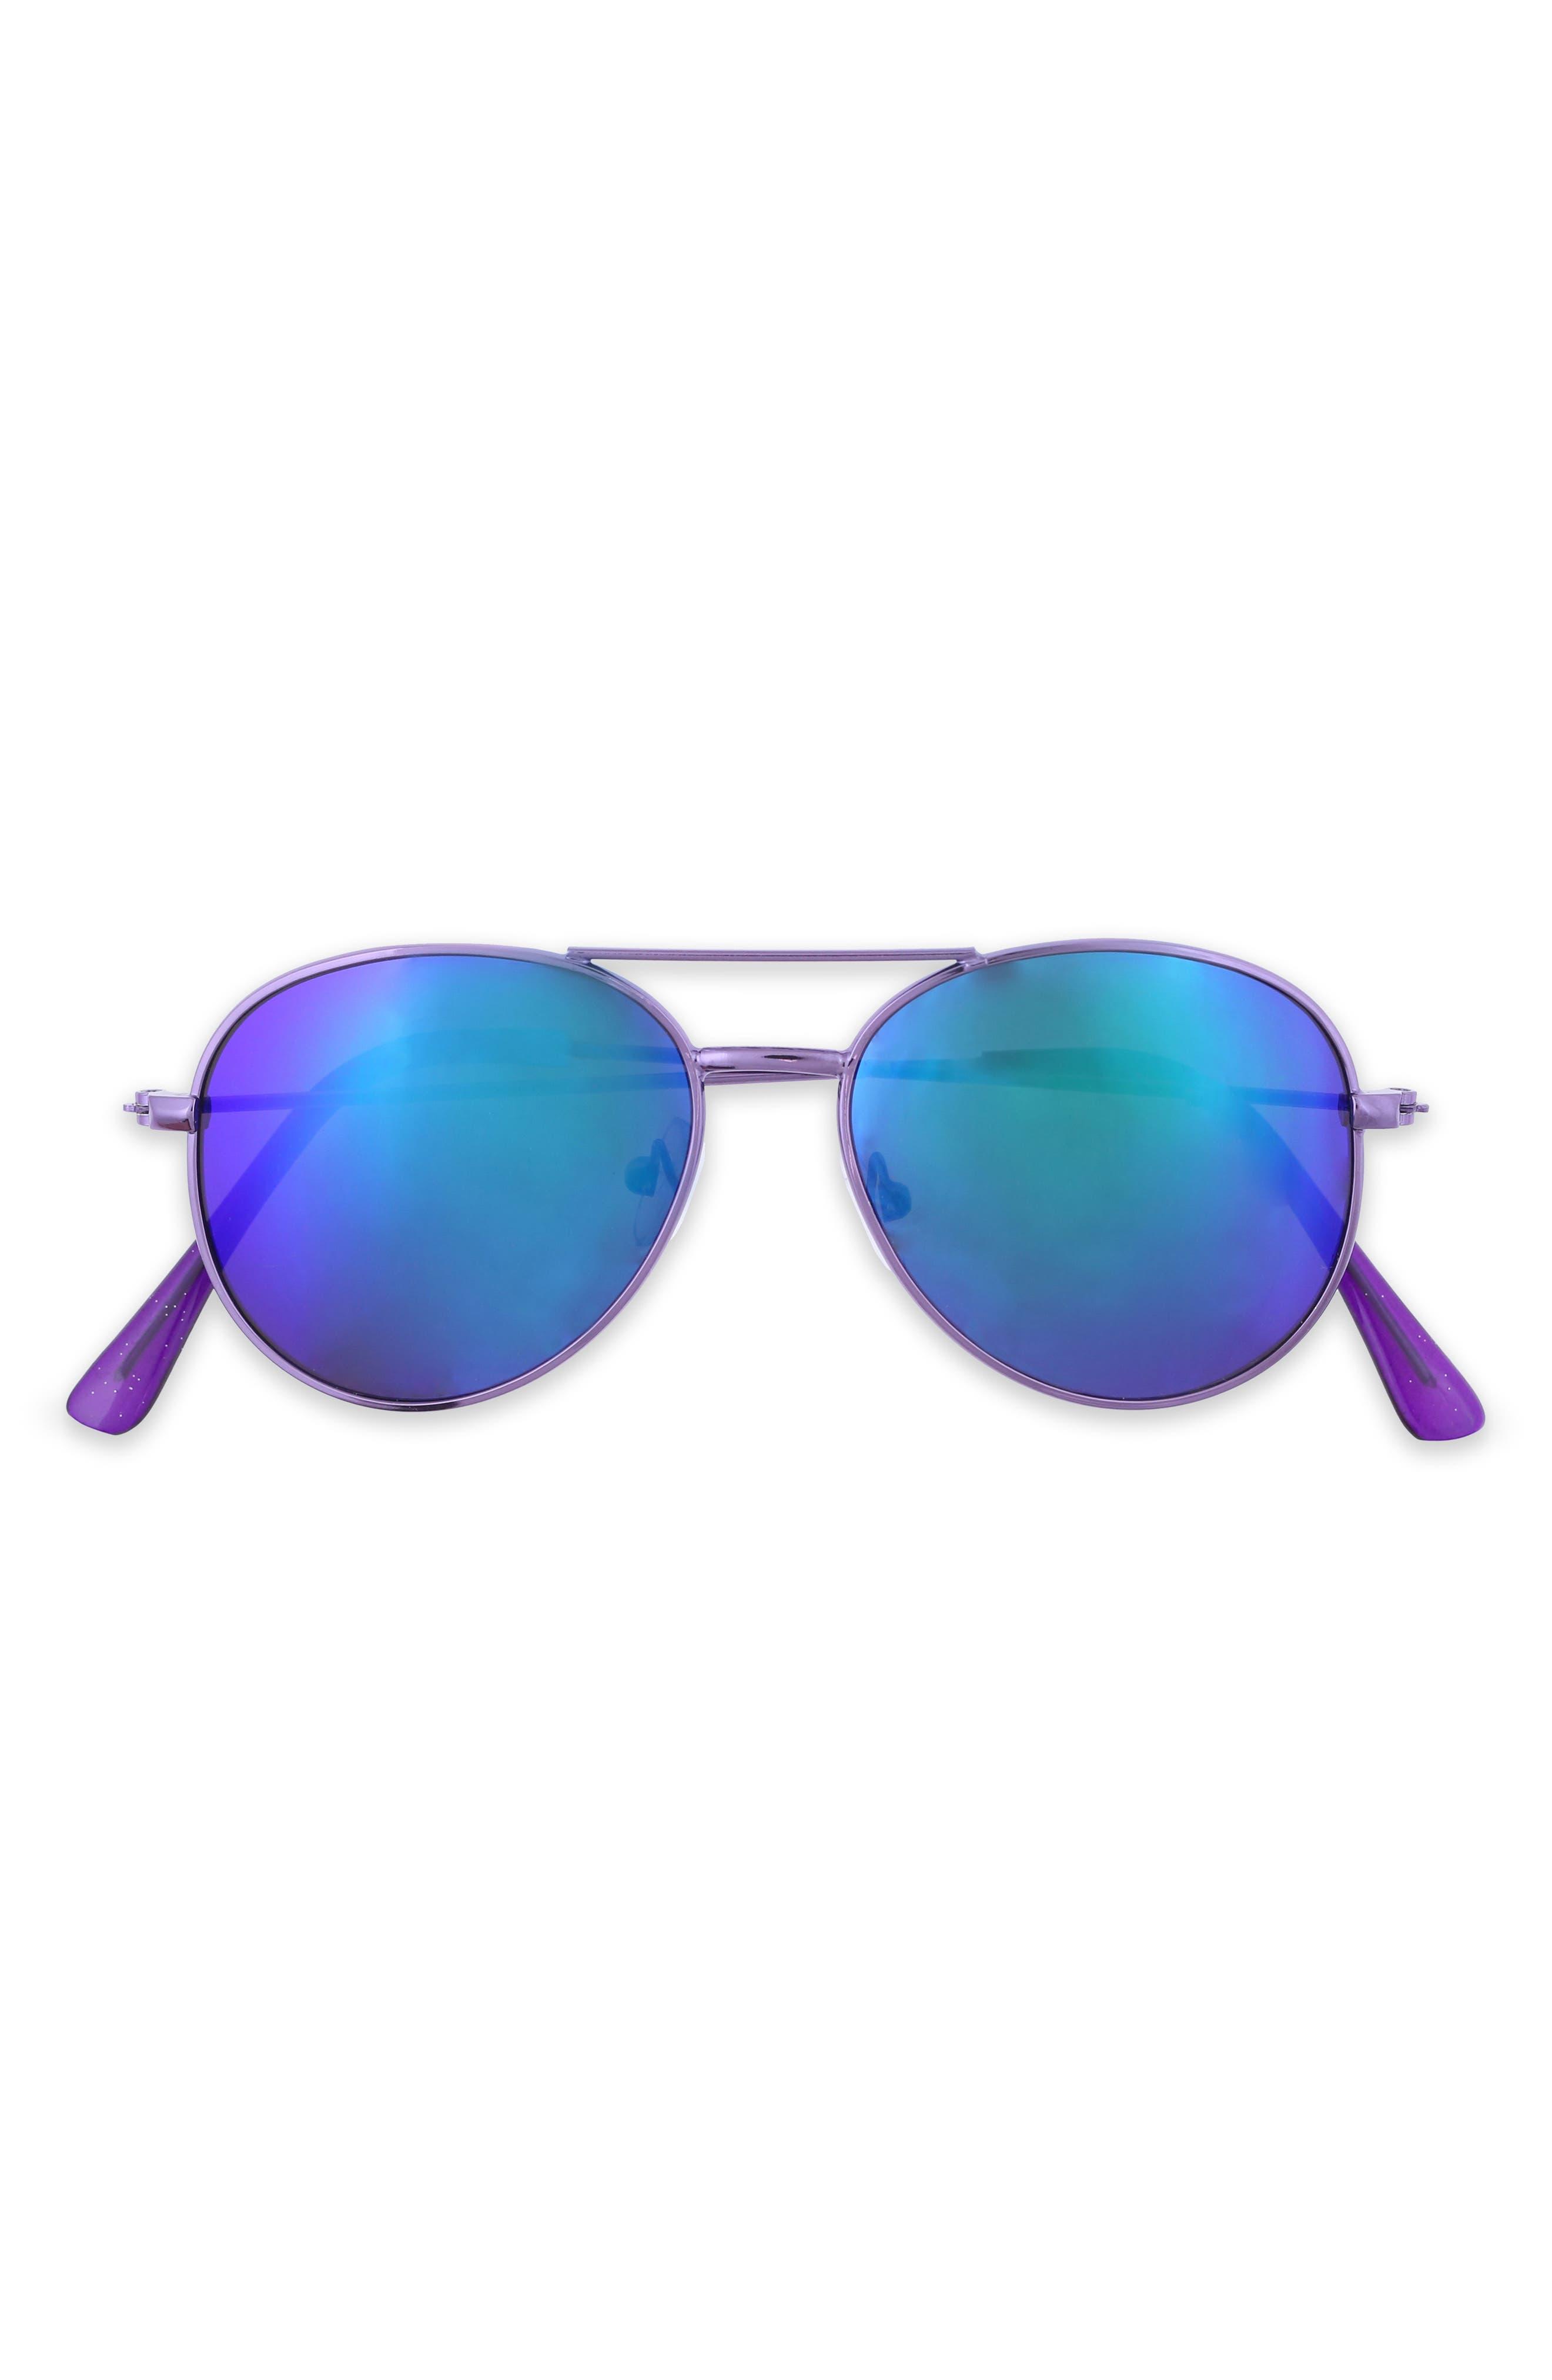 Mirrored Aviator Sunglasses,                         Main,                         color,